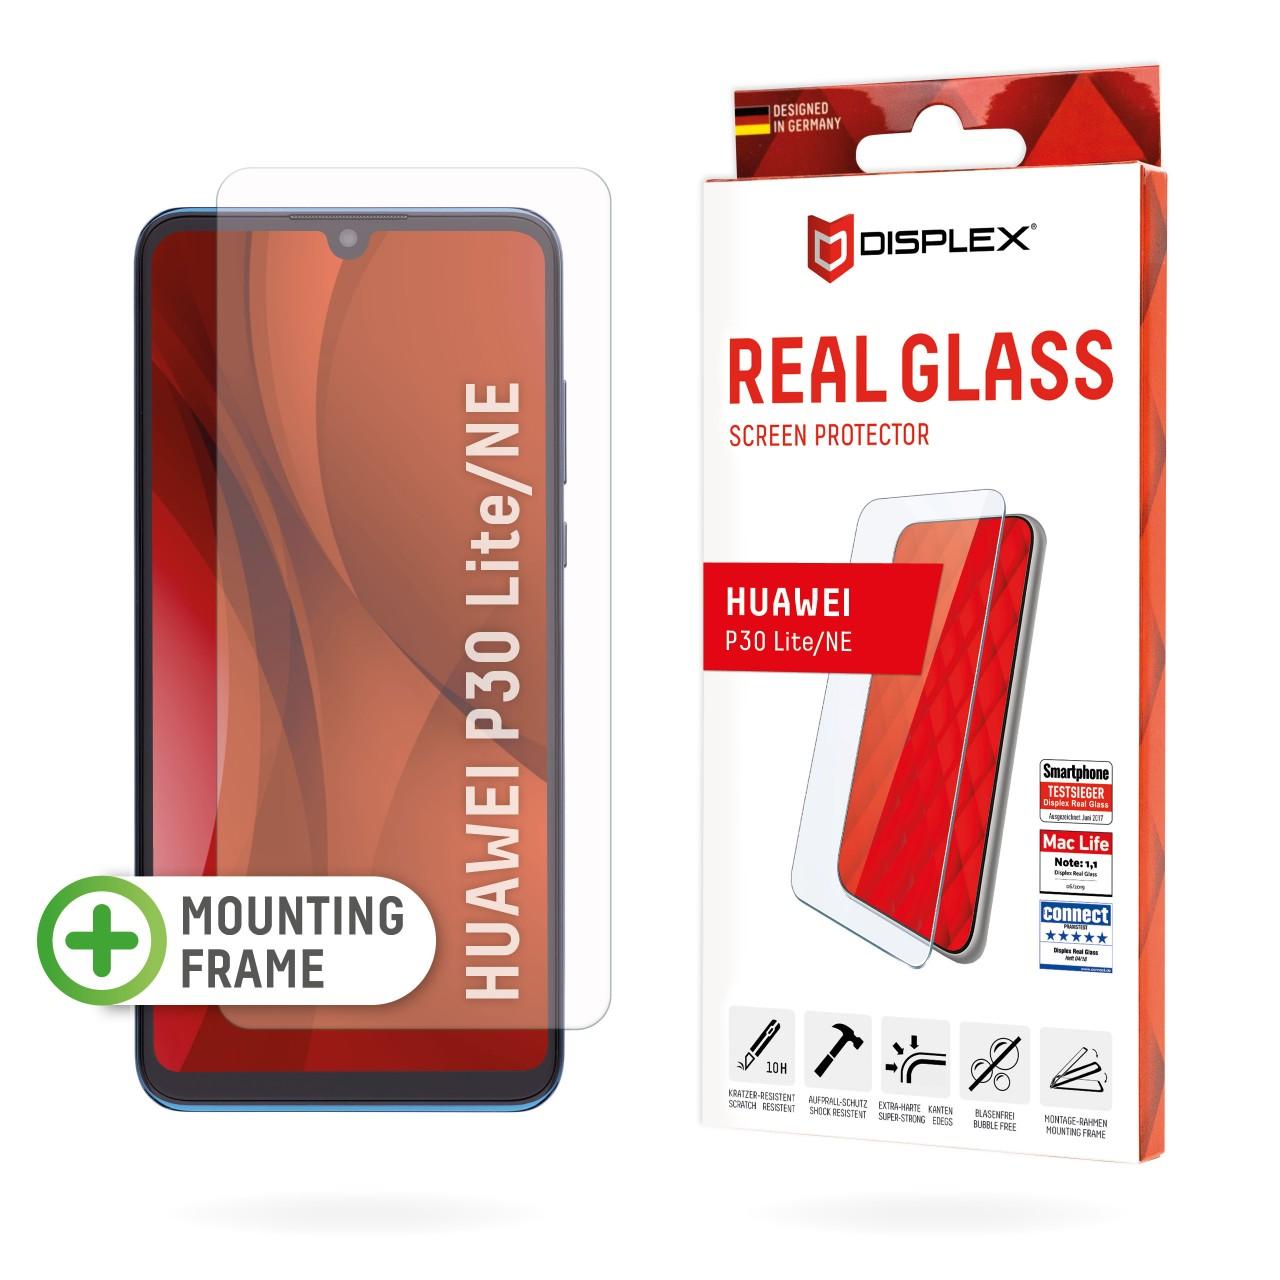 01059-HUAWEI-P30-Lite-NE-RealGlass-2D-EN